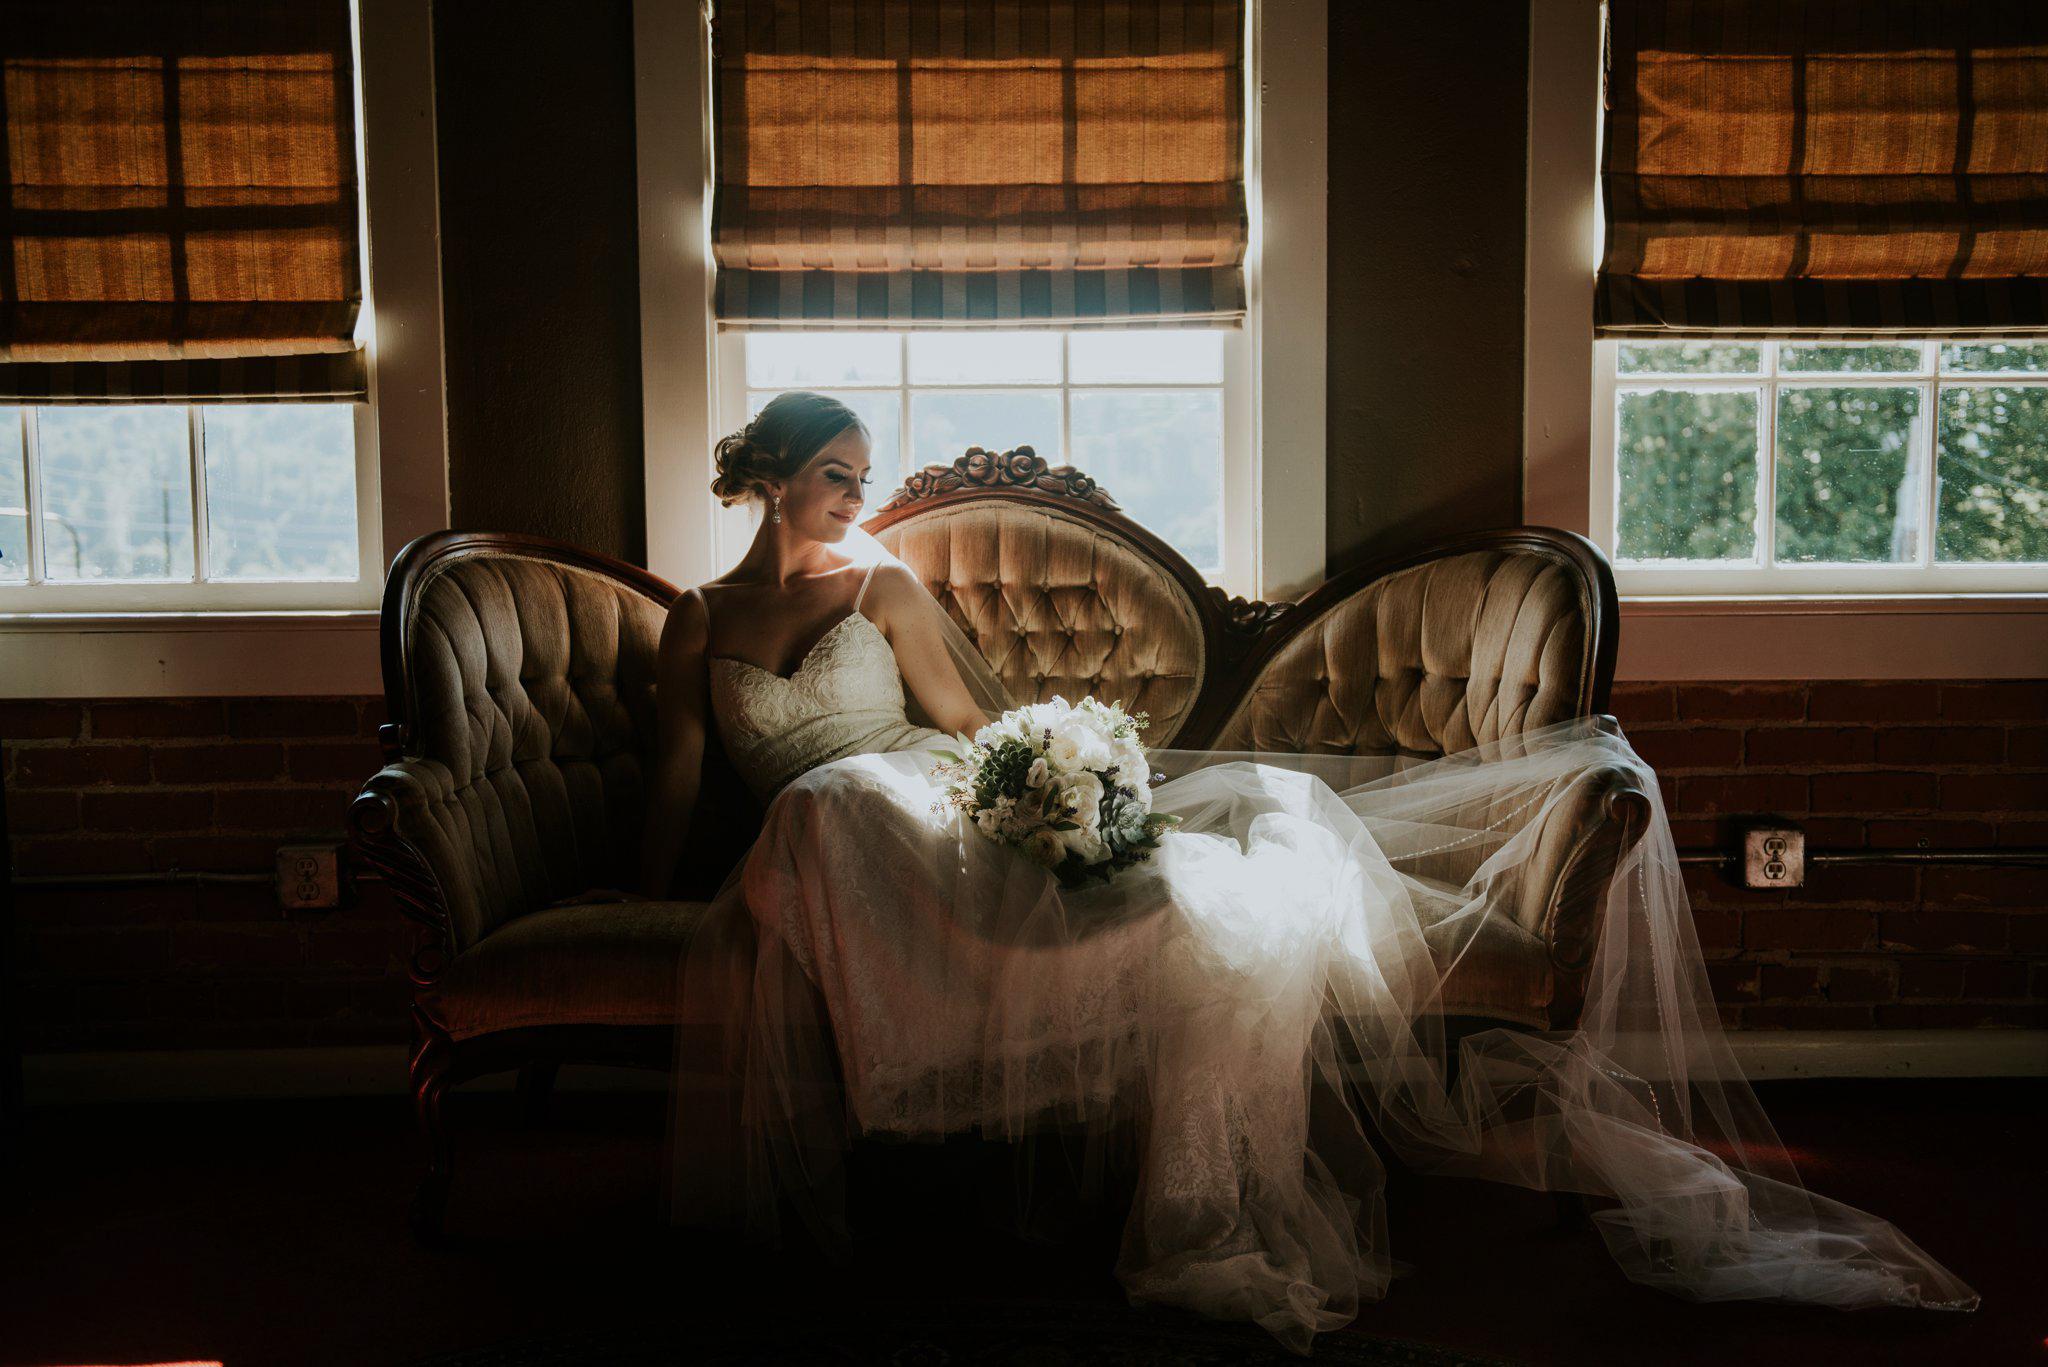 hollywood-school-house-wedding-seattle-photographer-caitlyn-nikula-61.jpg